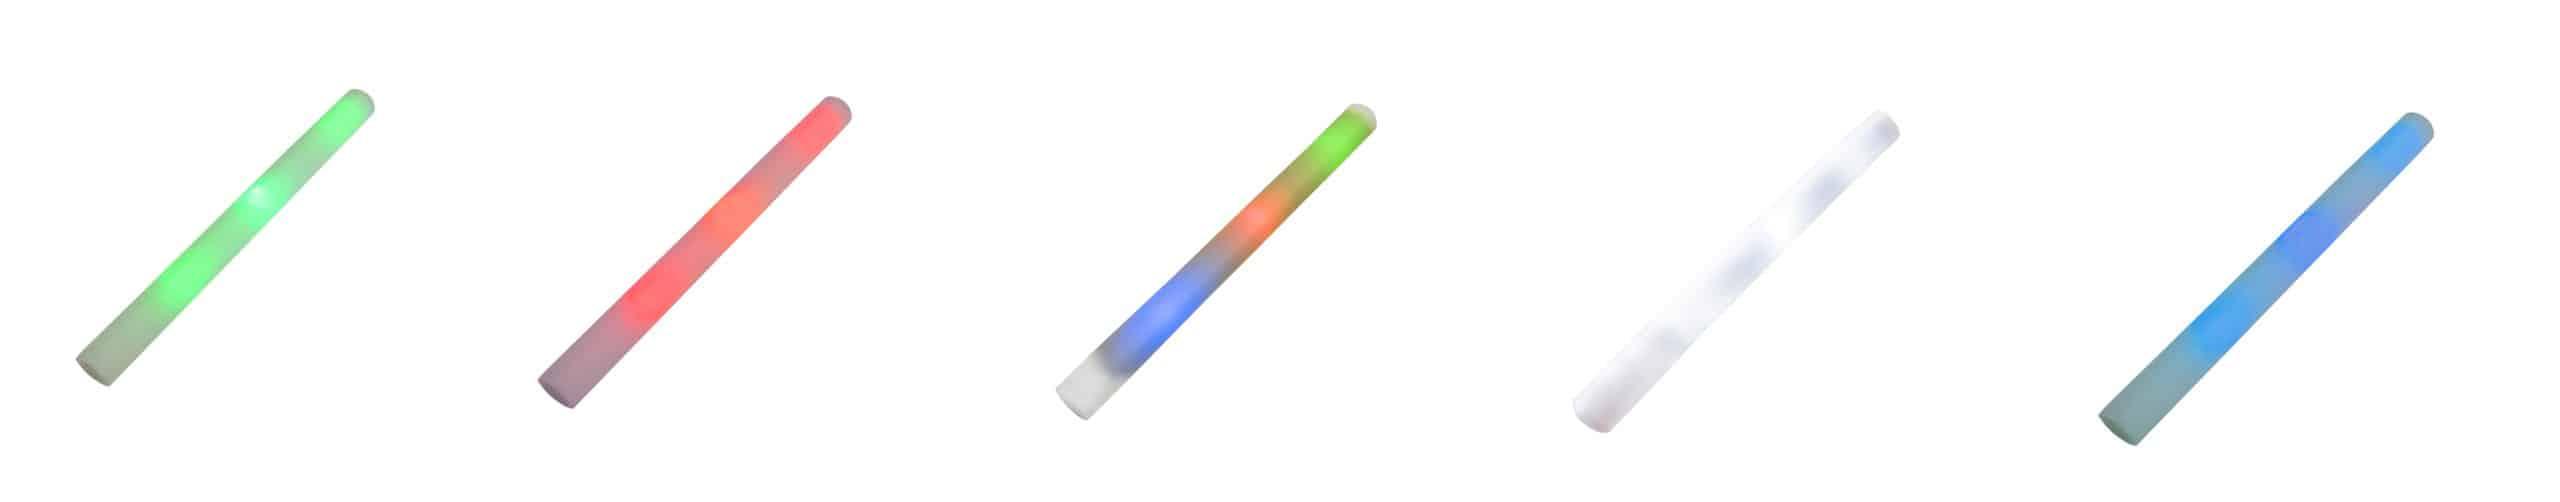 Palos LED multicolor